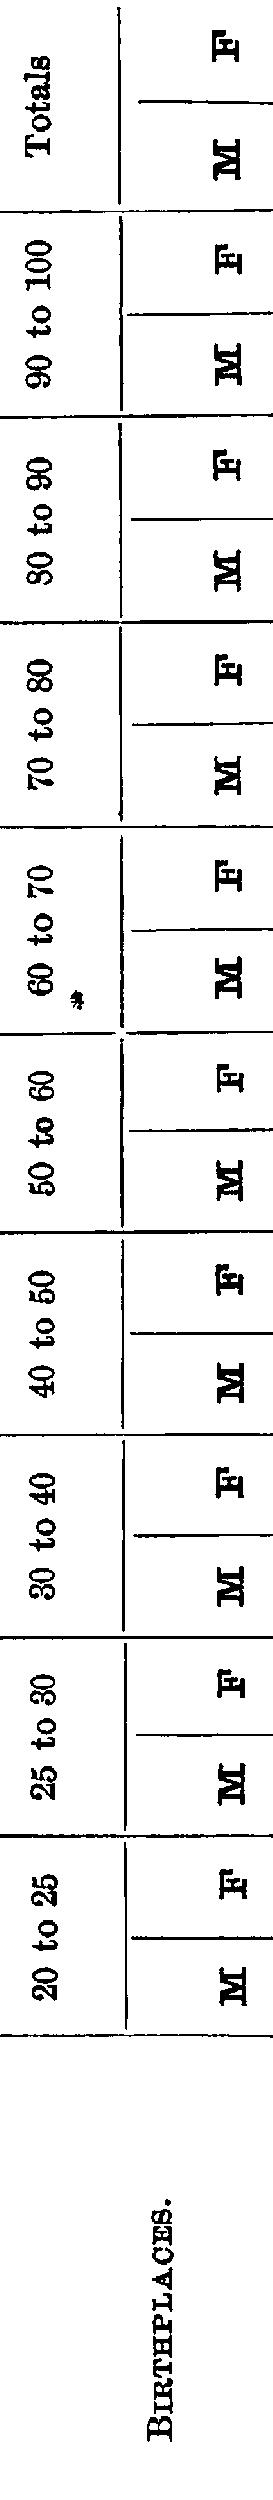 [merged small][subsumed][merged small][merged small][merged small][merged small][subsumed][merged small][merged small][merged small][merged small][merged small][merged small][subsumed][subsumed][subsumed][merged small][subsumed][merged small][merged small][merged small][subsumed][subsumed][merged small][merged small][ocr errors][ocr errors][ocr errors][ocr errors]